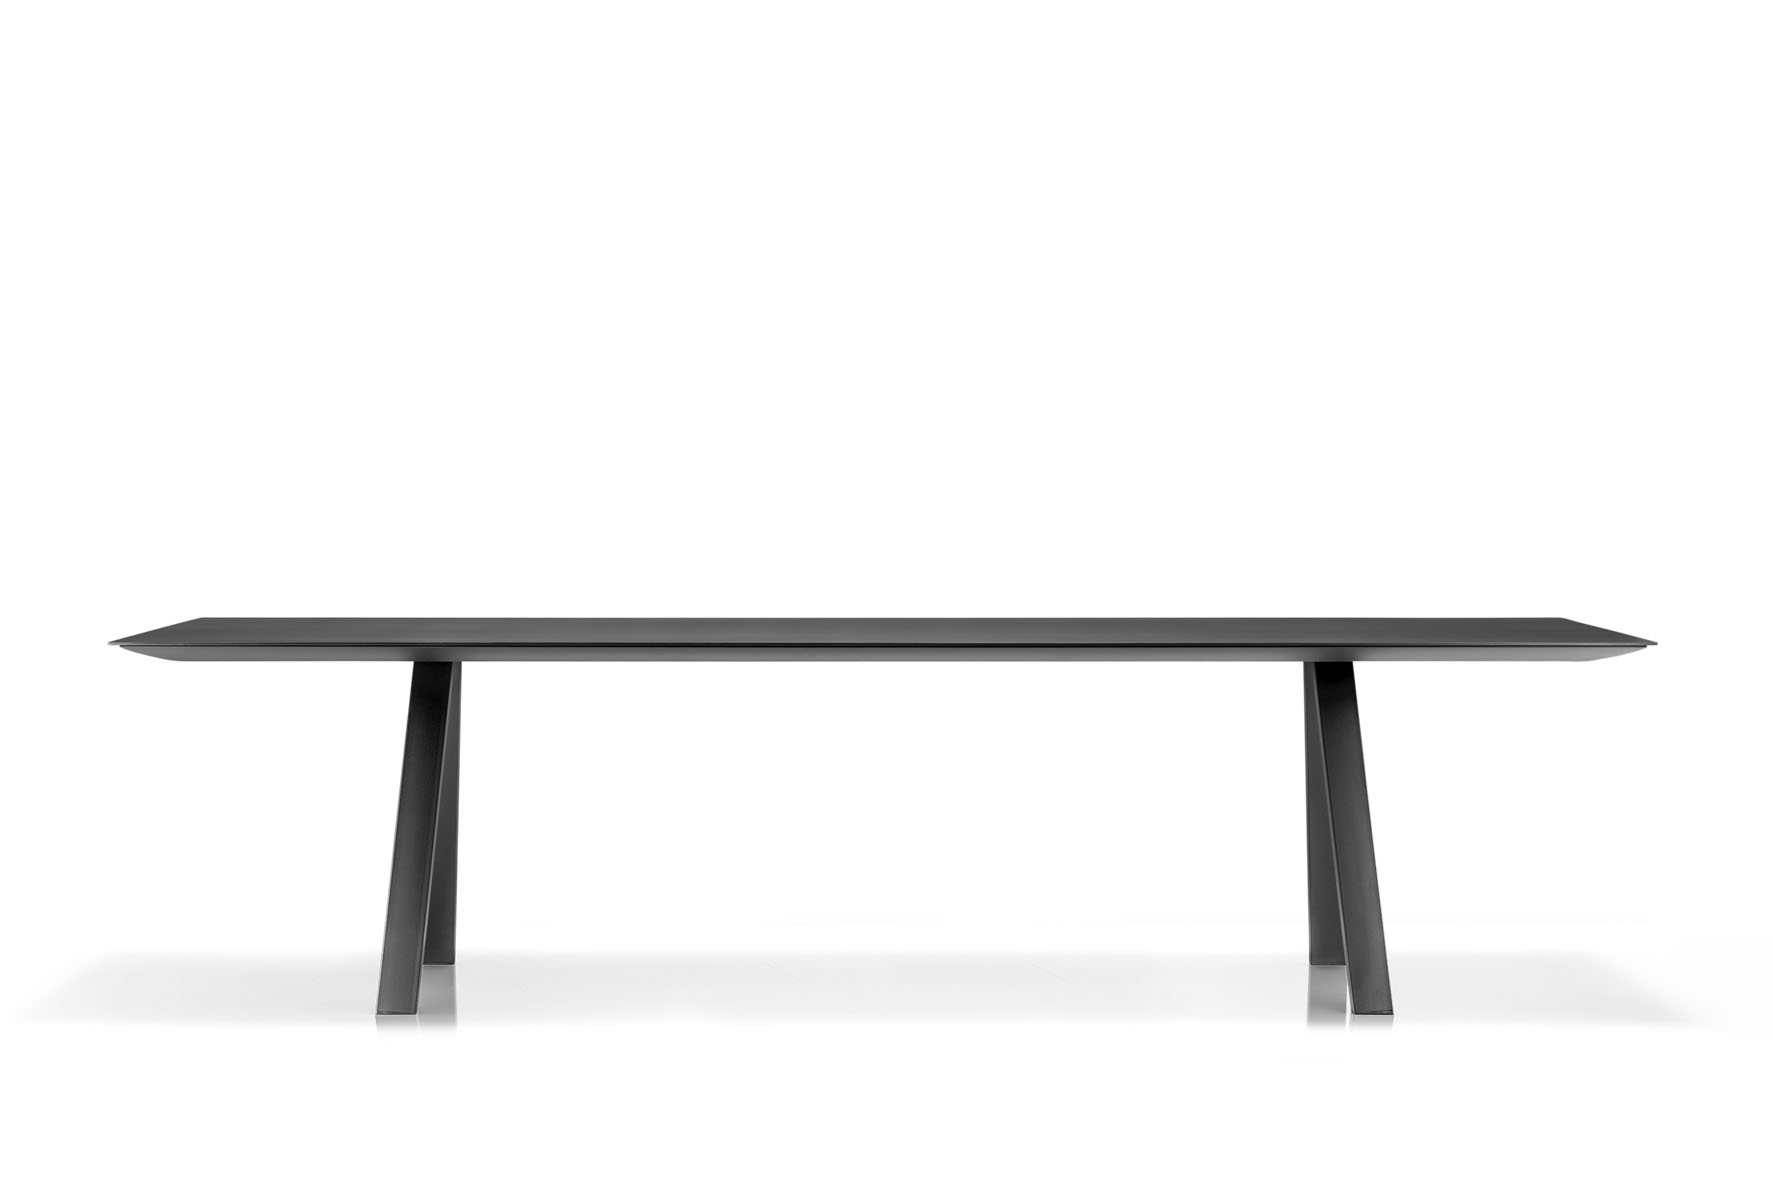 Stół designerski ARKI TABLE PEDRALI